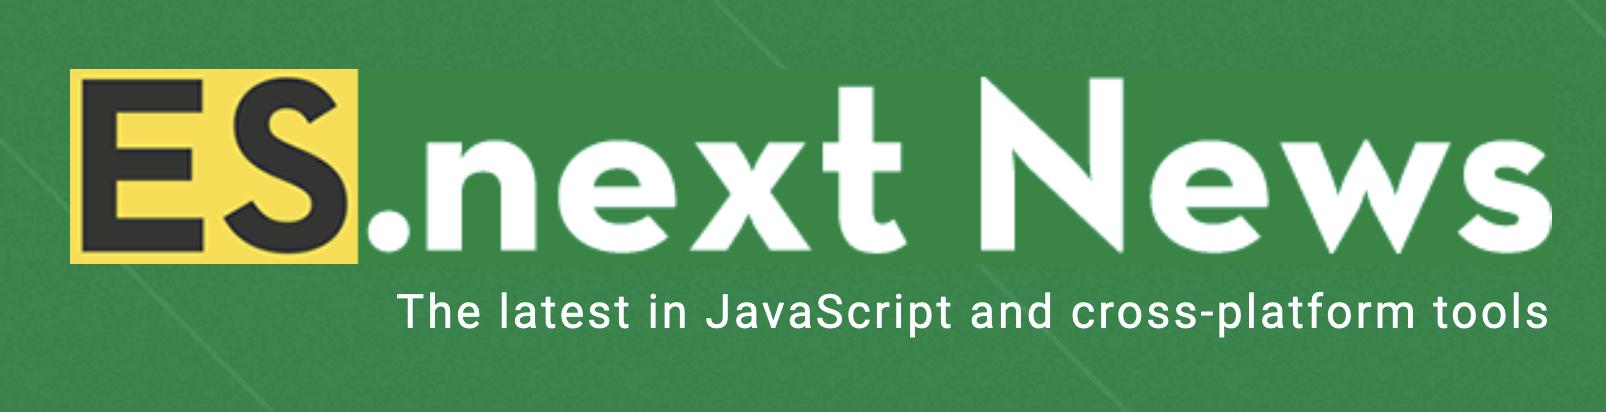 ES.next news News – The latest in JavaScript and cross-platform tools